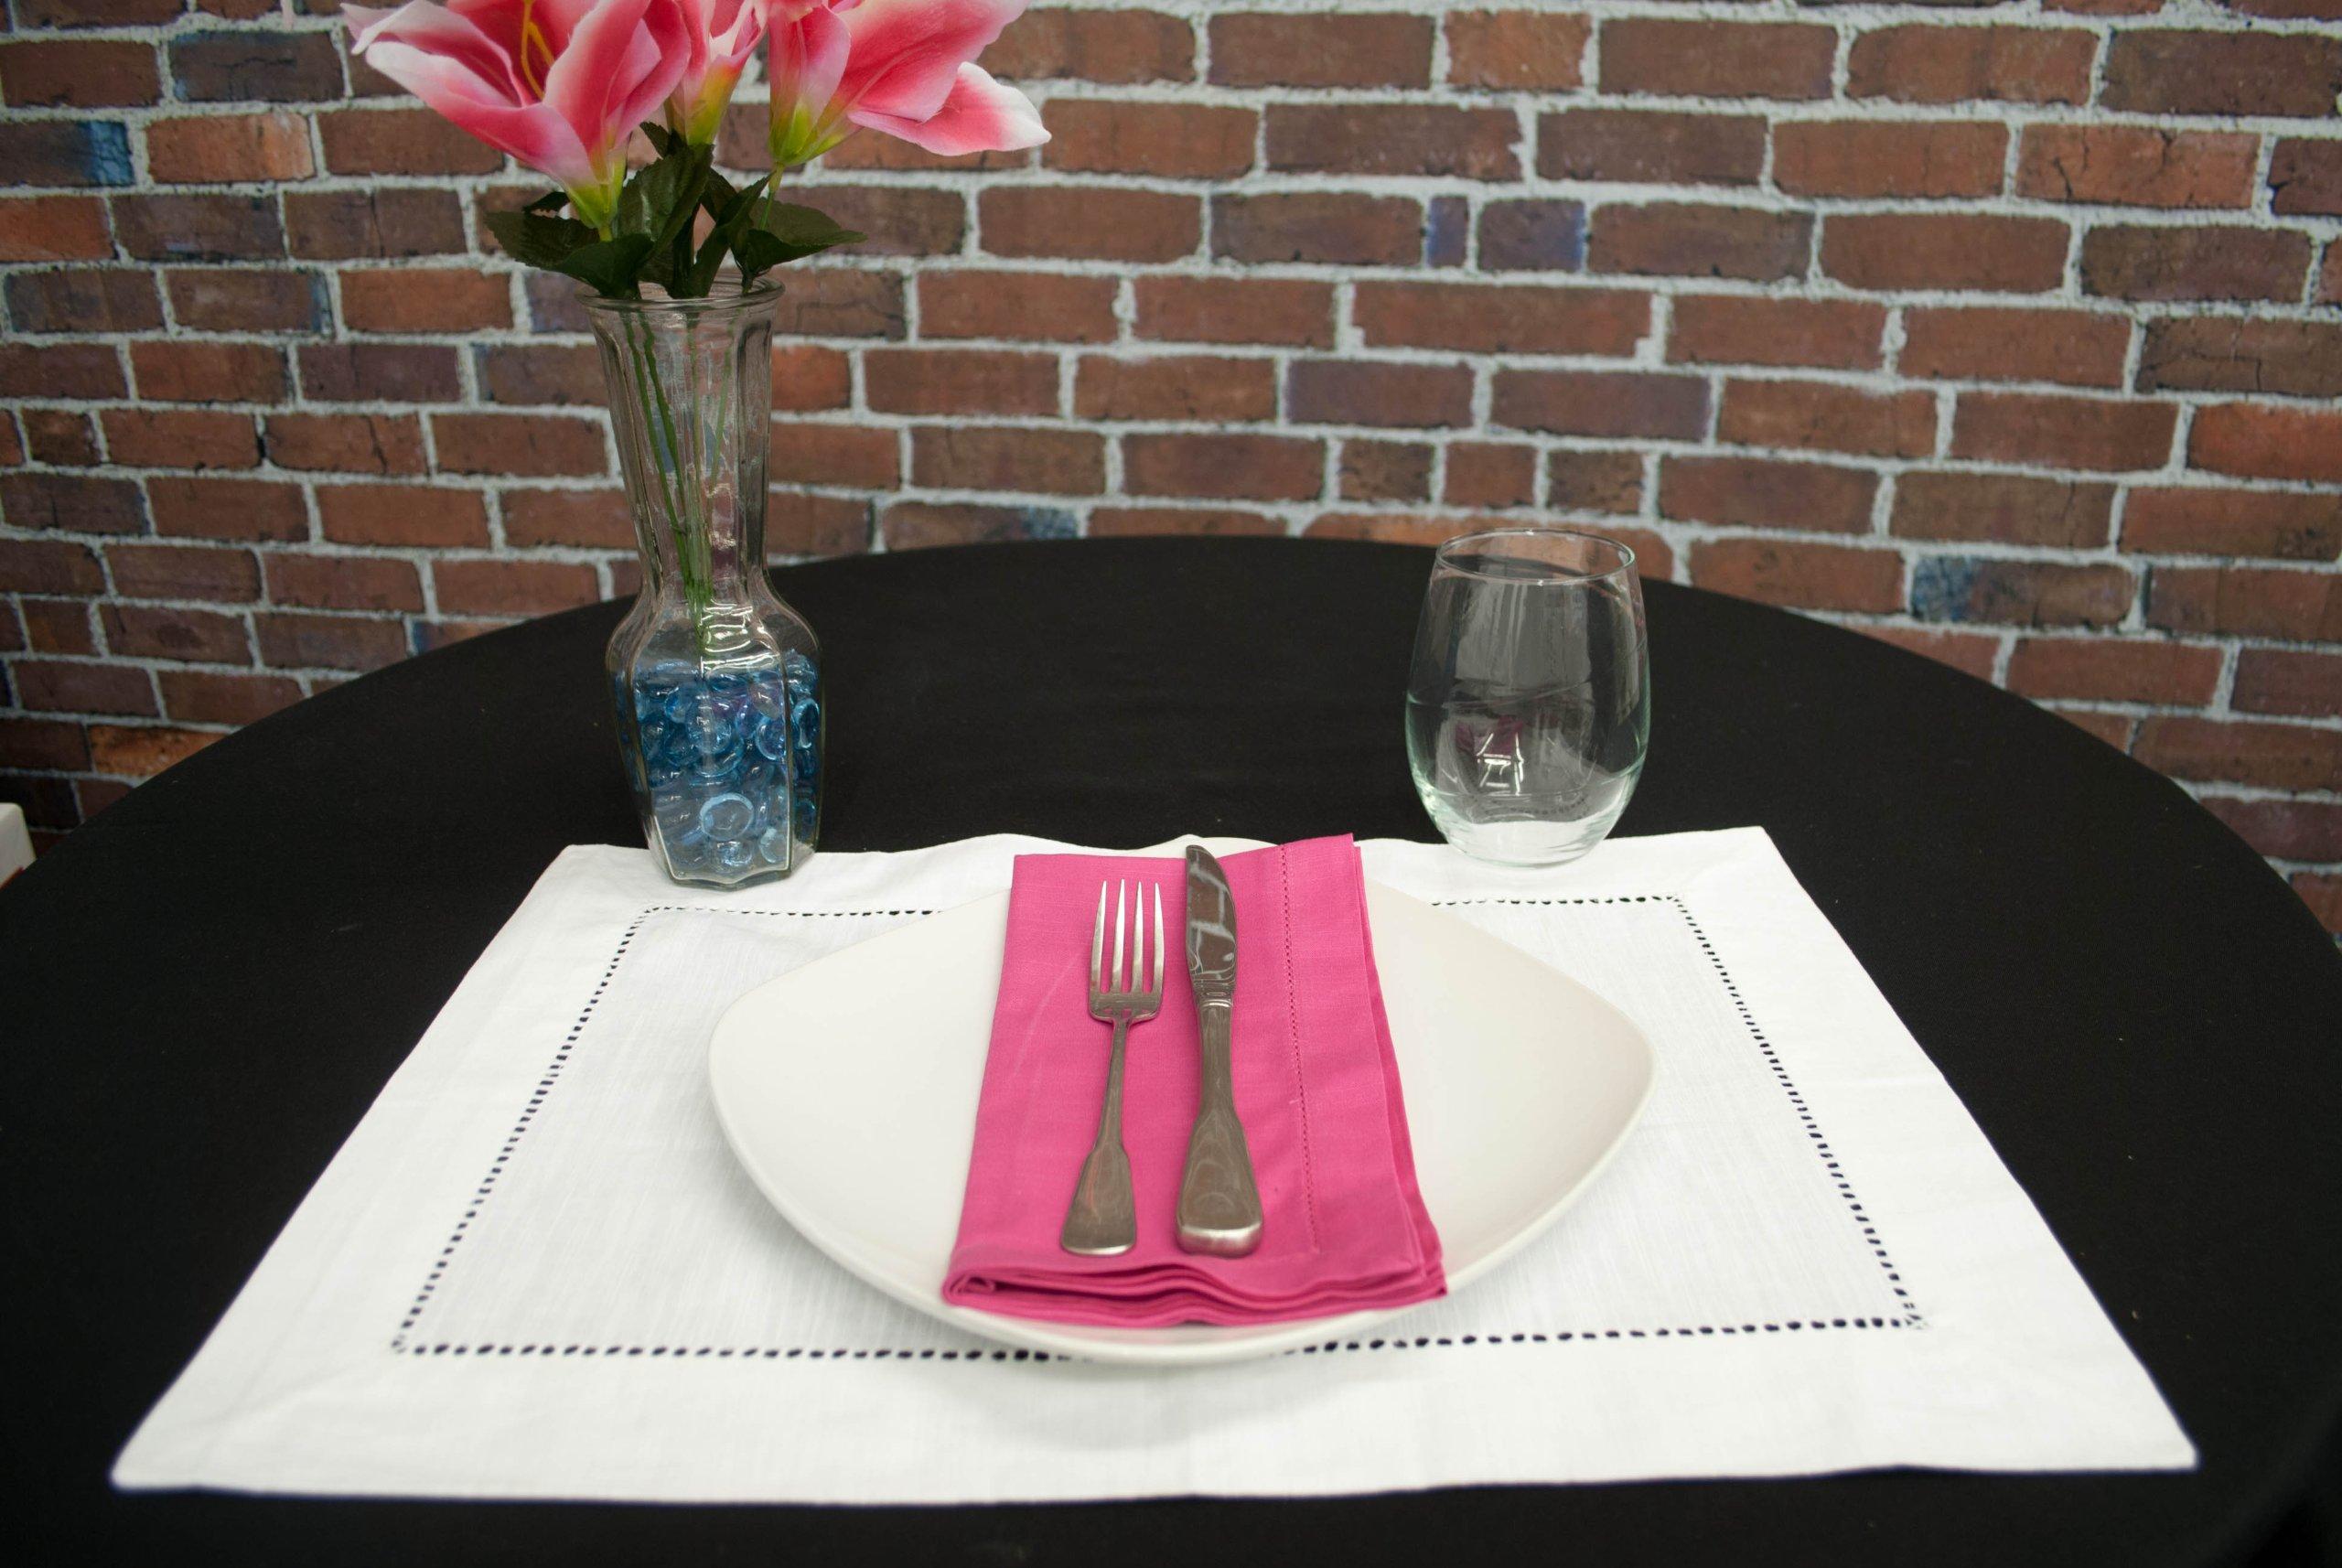 Hemstitch Dinner Napkins Hot Pink 1 Dozen by Something Different Linen (Image #3)